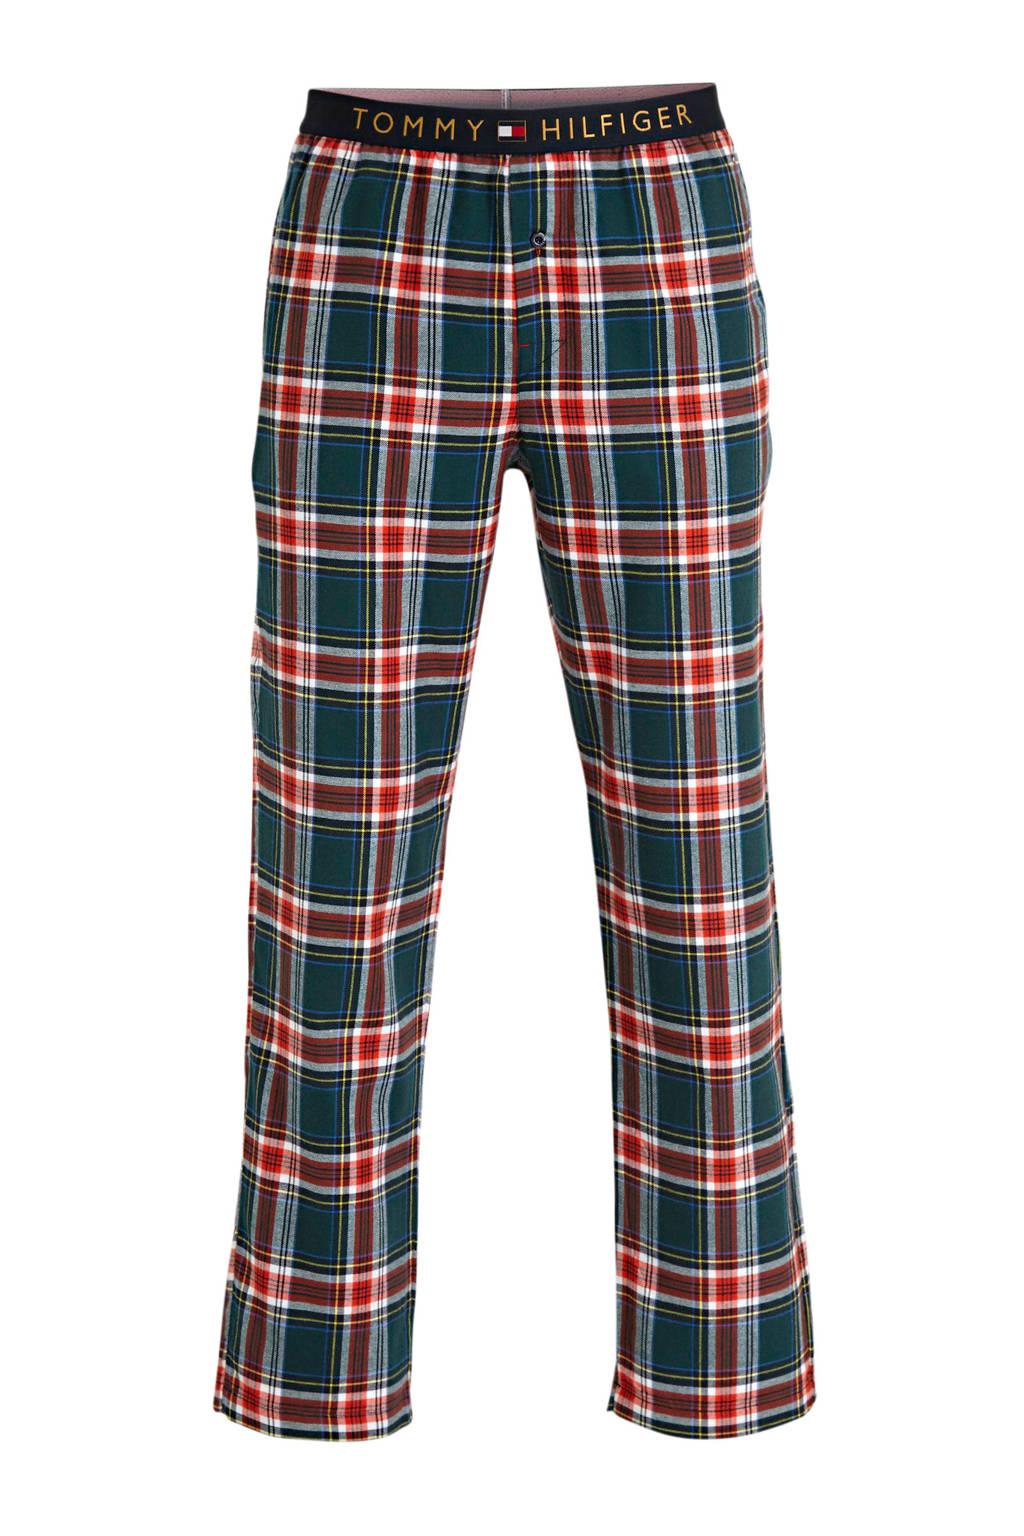 Tommy Hilfiger geruite flanellen pyjamabroek donkerblauw/groen, Donkerblauw/groen